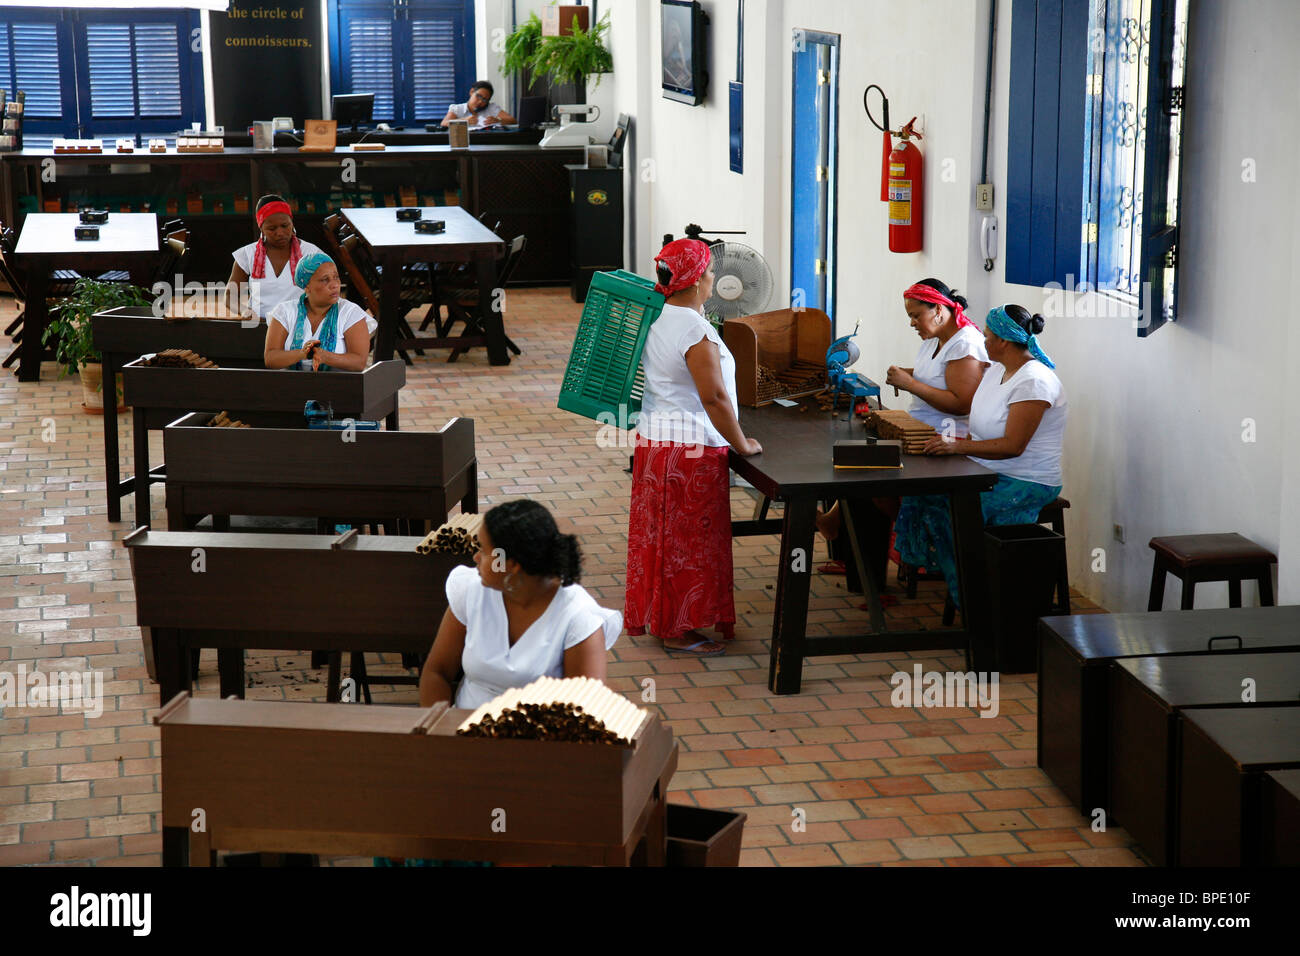 Frauen, die Zigarren in der Dannemann-Fabrik in Sao Felix, Bahia, Brasilien. Stockbild